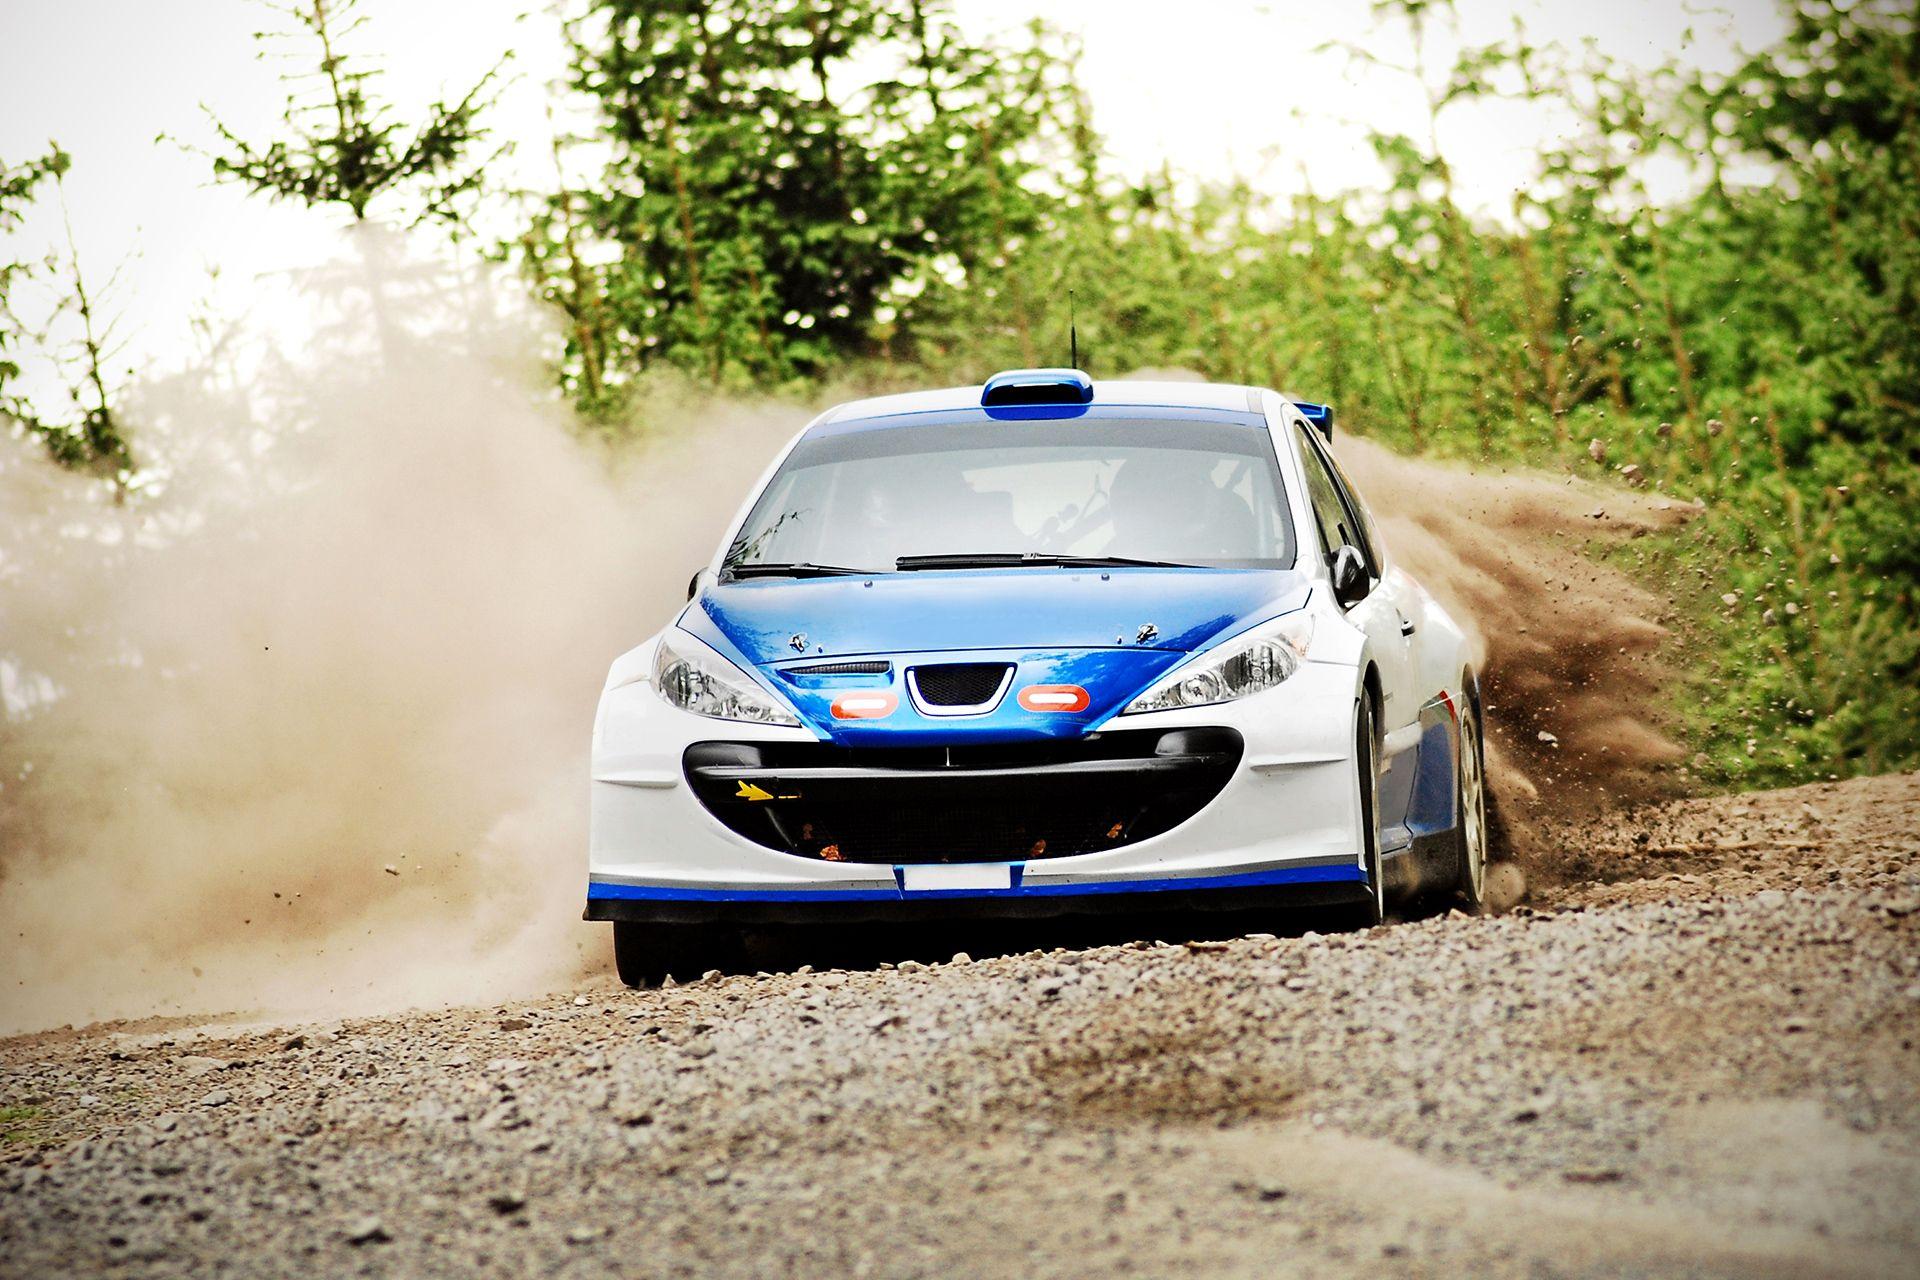 Rallye Beifahrer Ab 159 Fahrspaß Verschenken